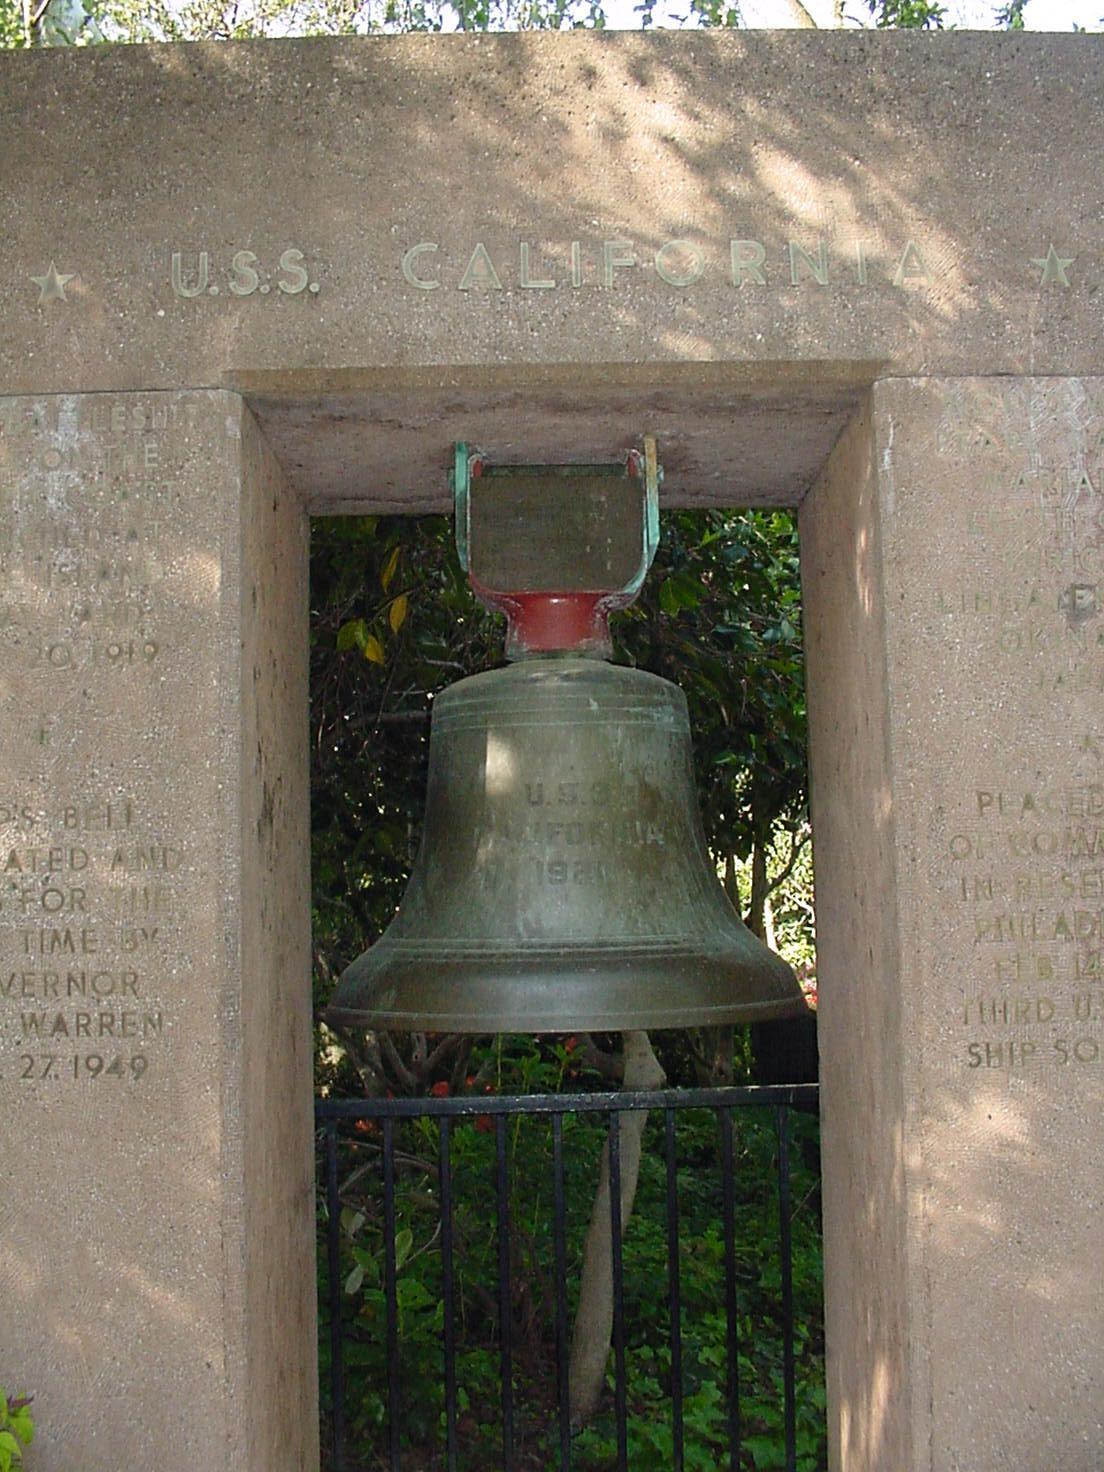 Bell - U.S.S. California